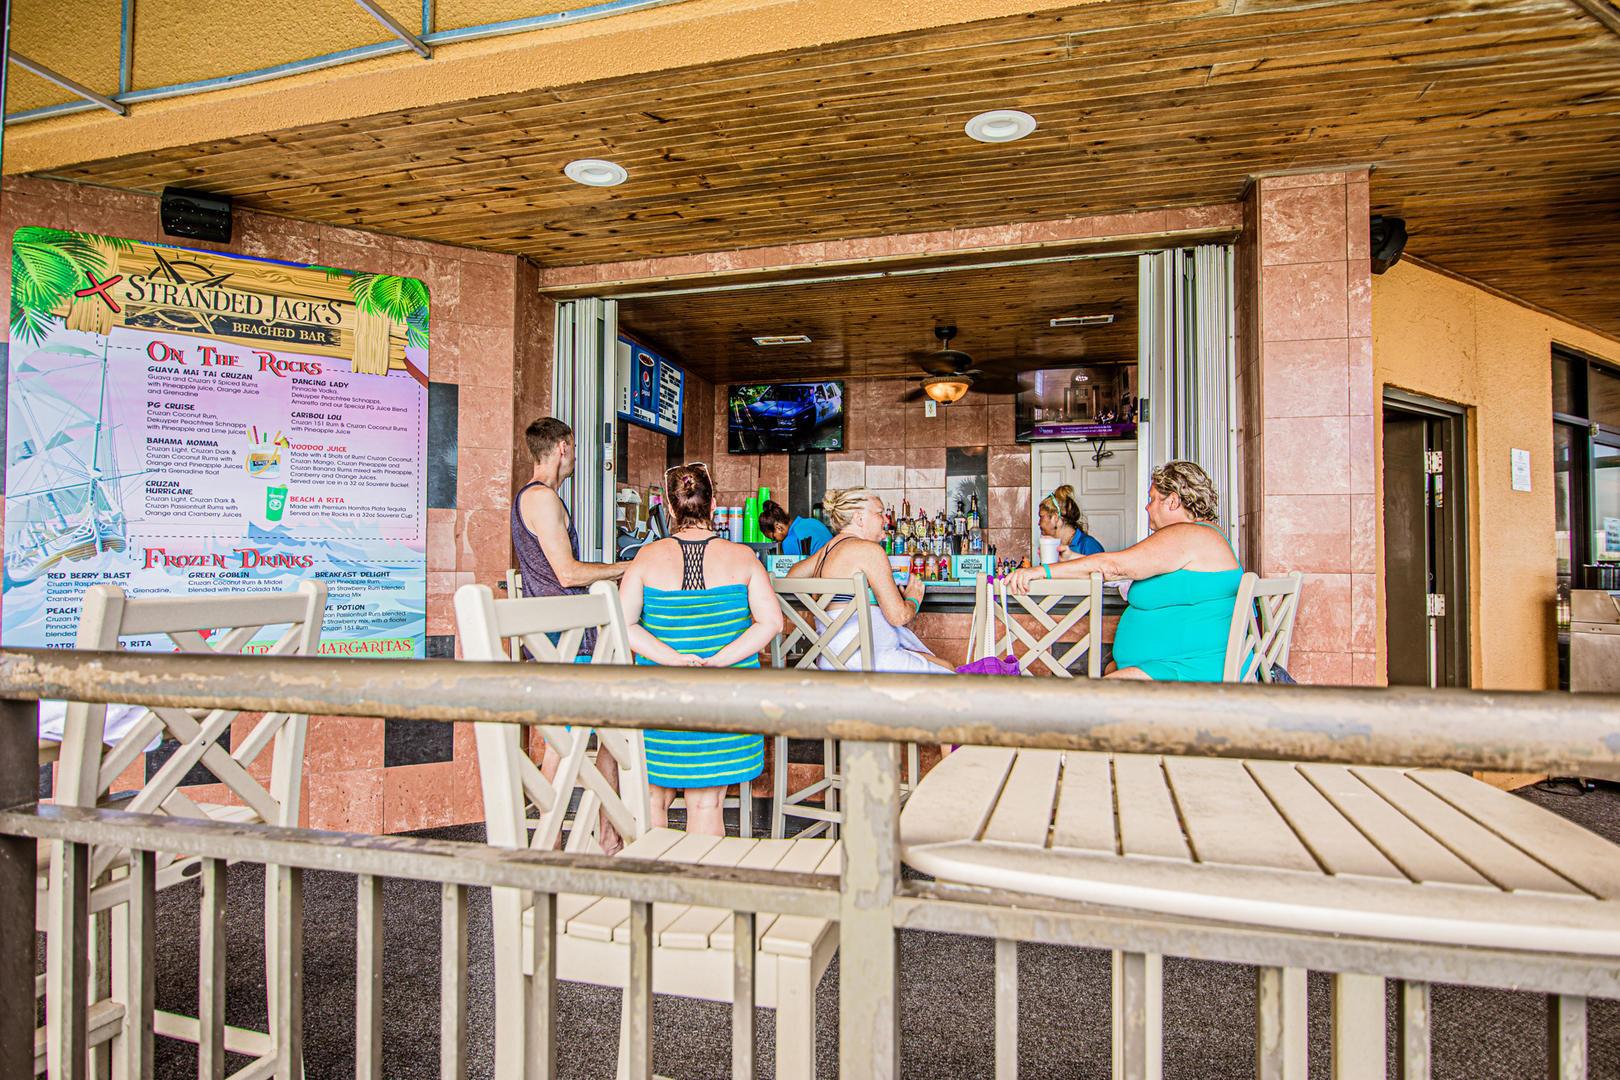 Patricia Grand Pool Bar (open seasonally)